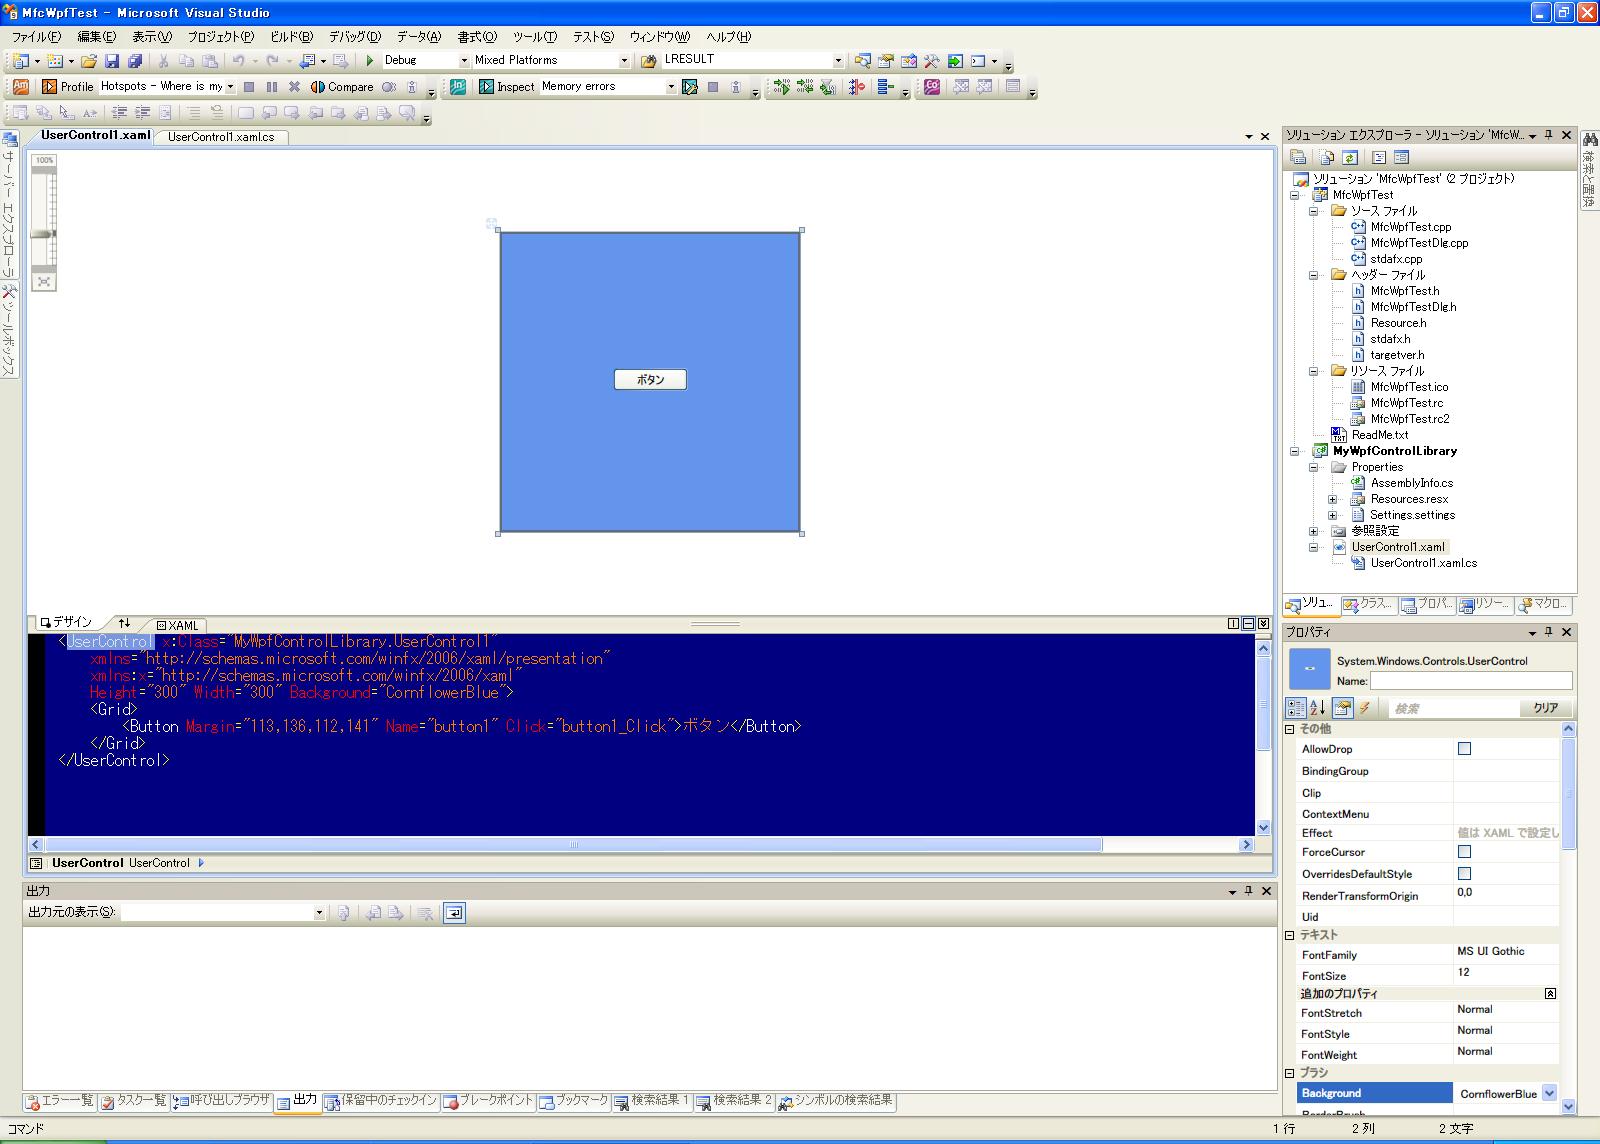 https://sygh-jp.github.io/content_hosting/my_program_ss/Wpf_Designer_Error_ss_2010_05_31e.png